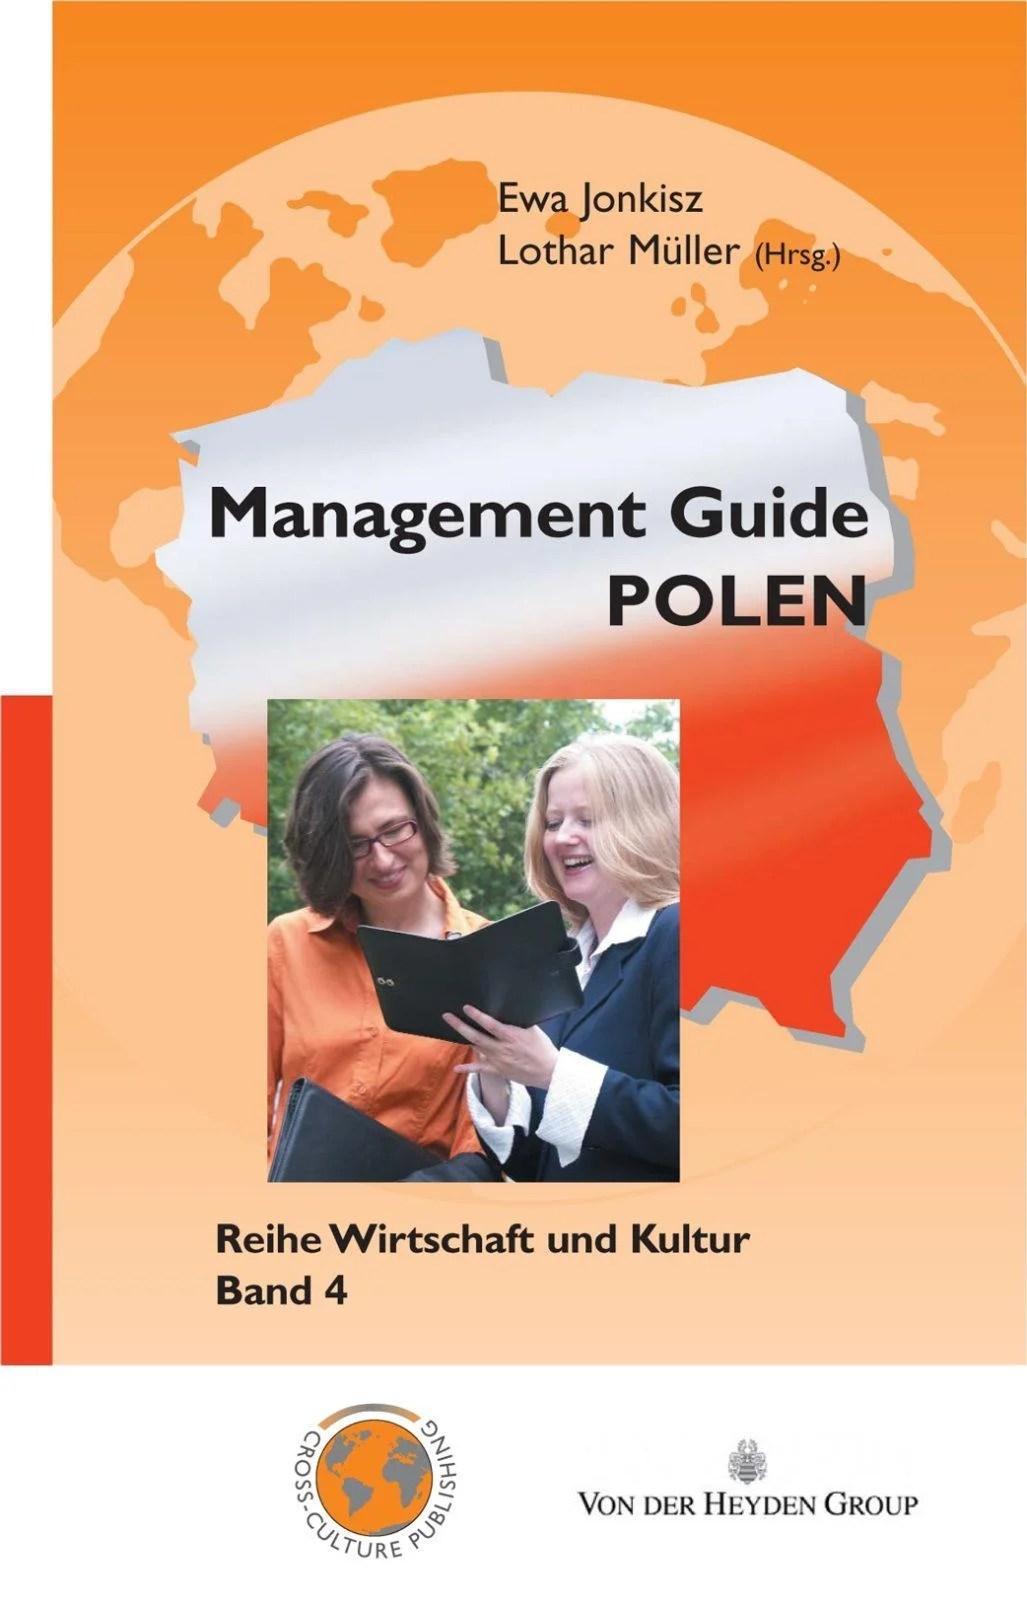 Management Guide Poland